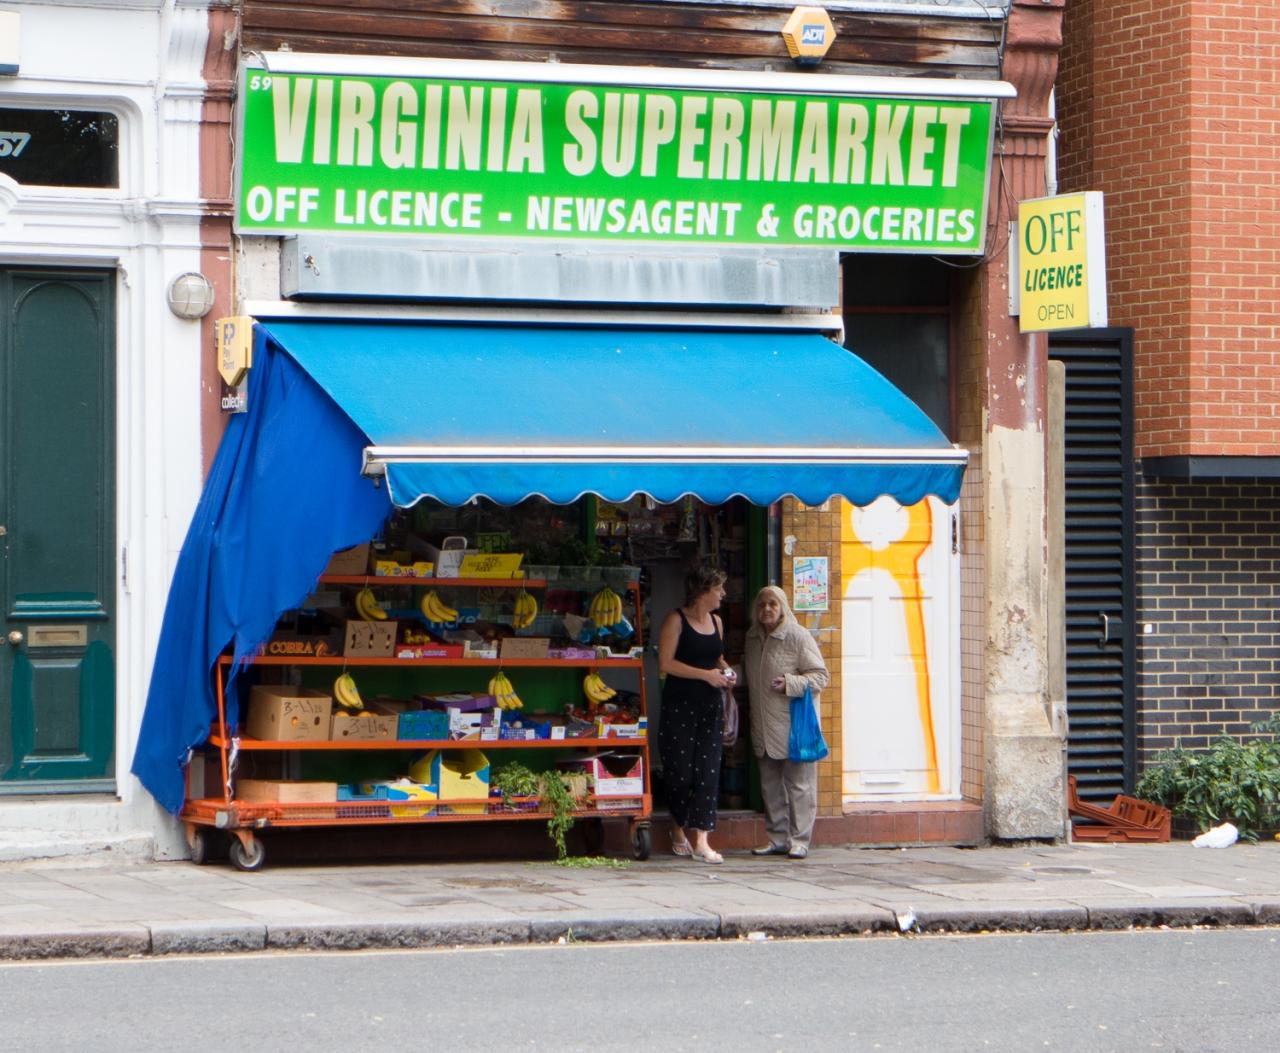 Virginia Supermarket